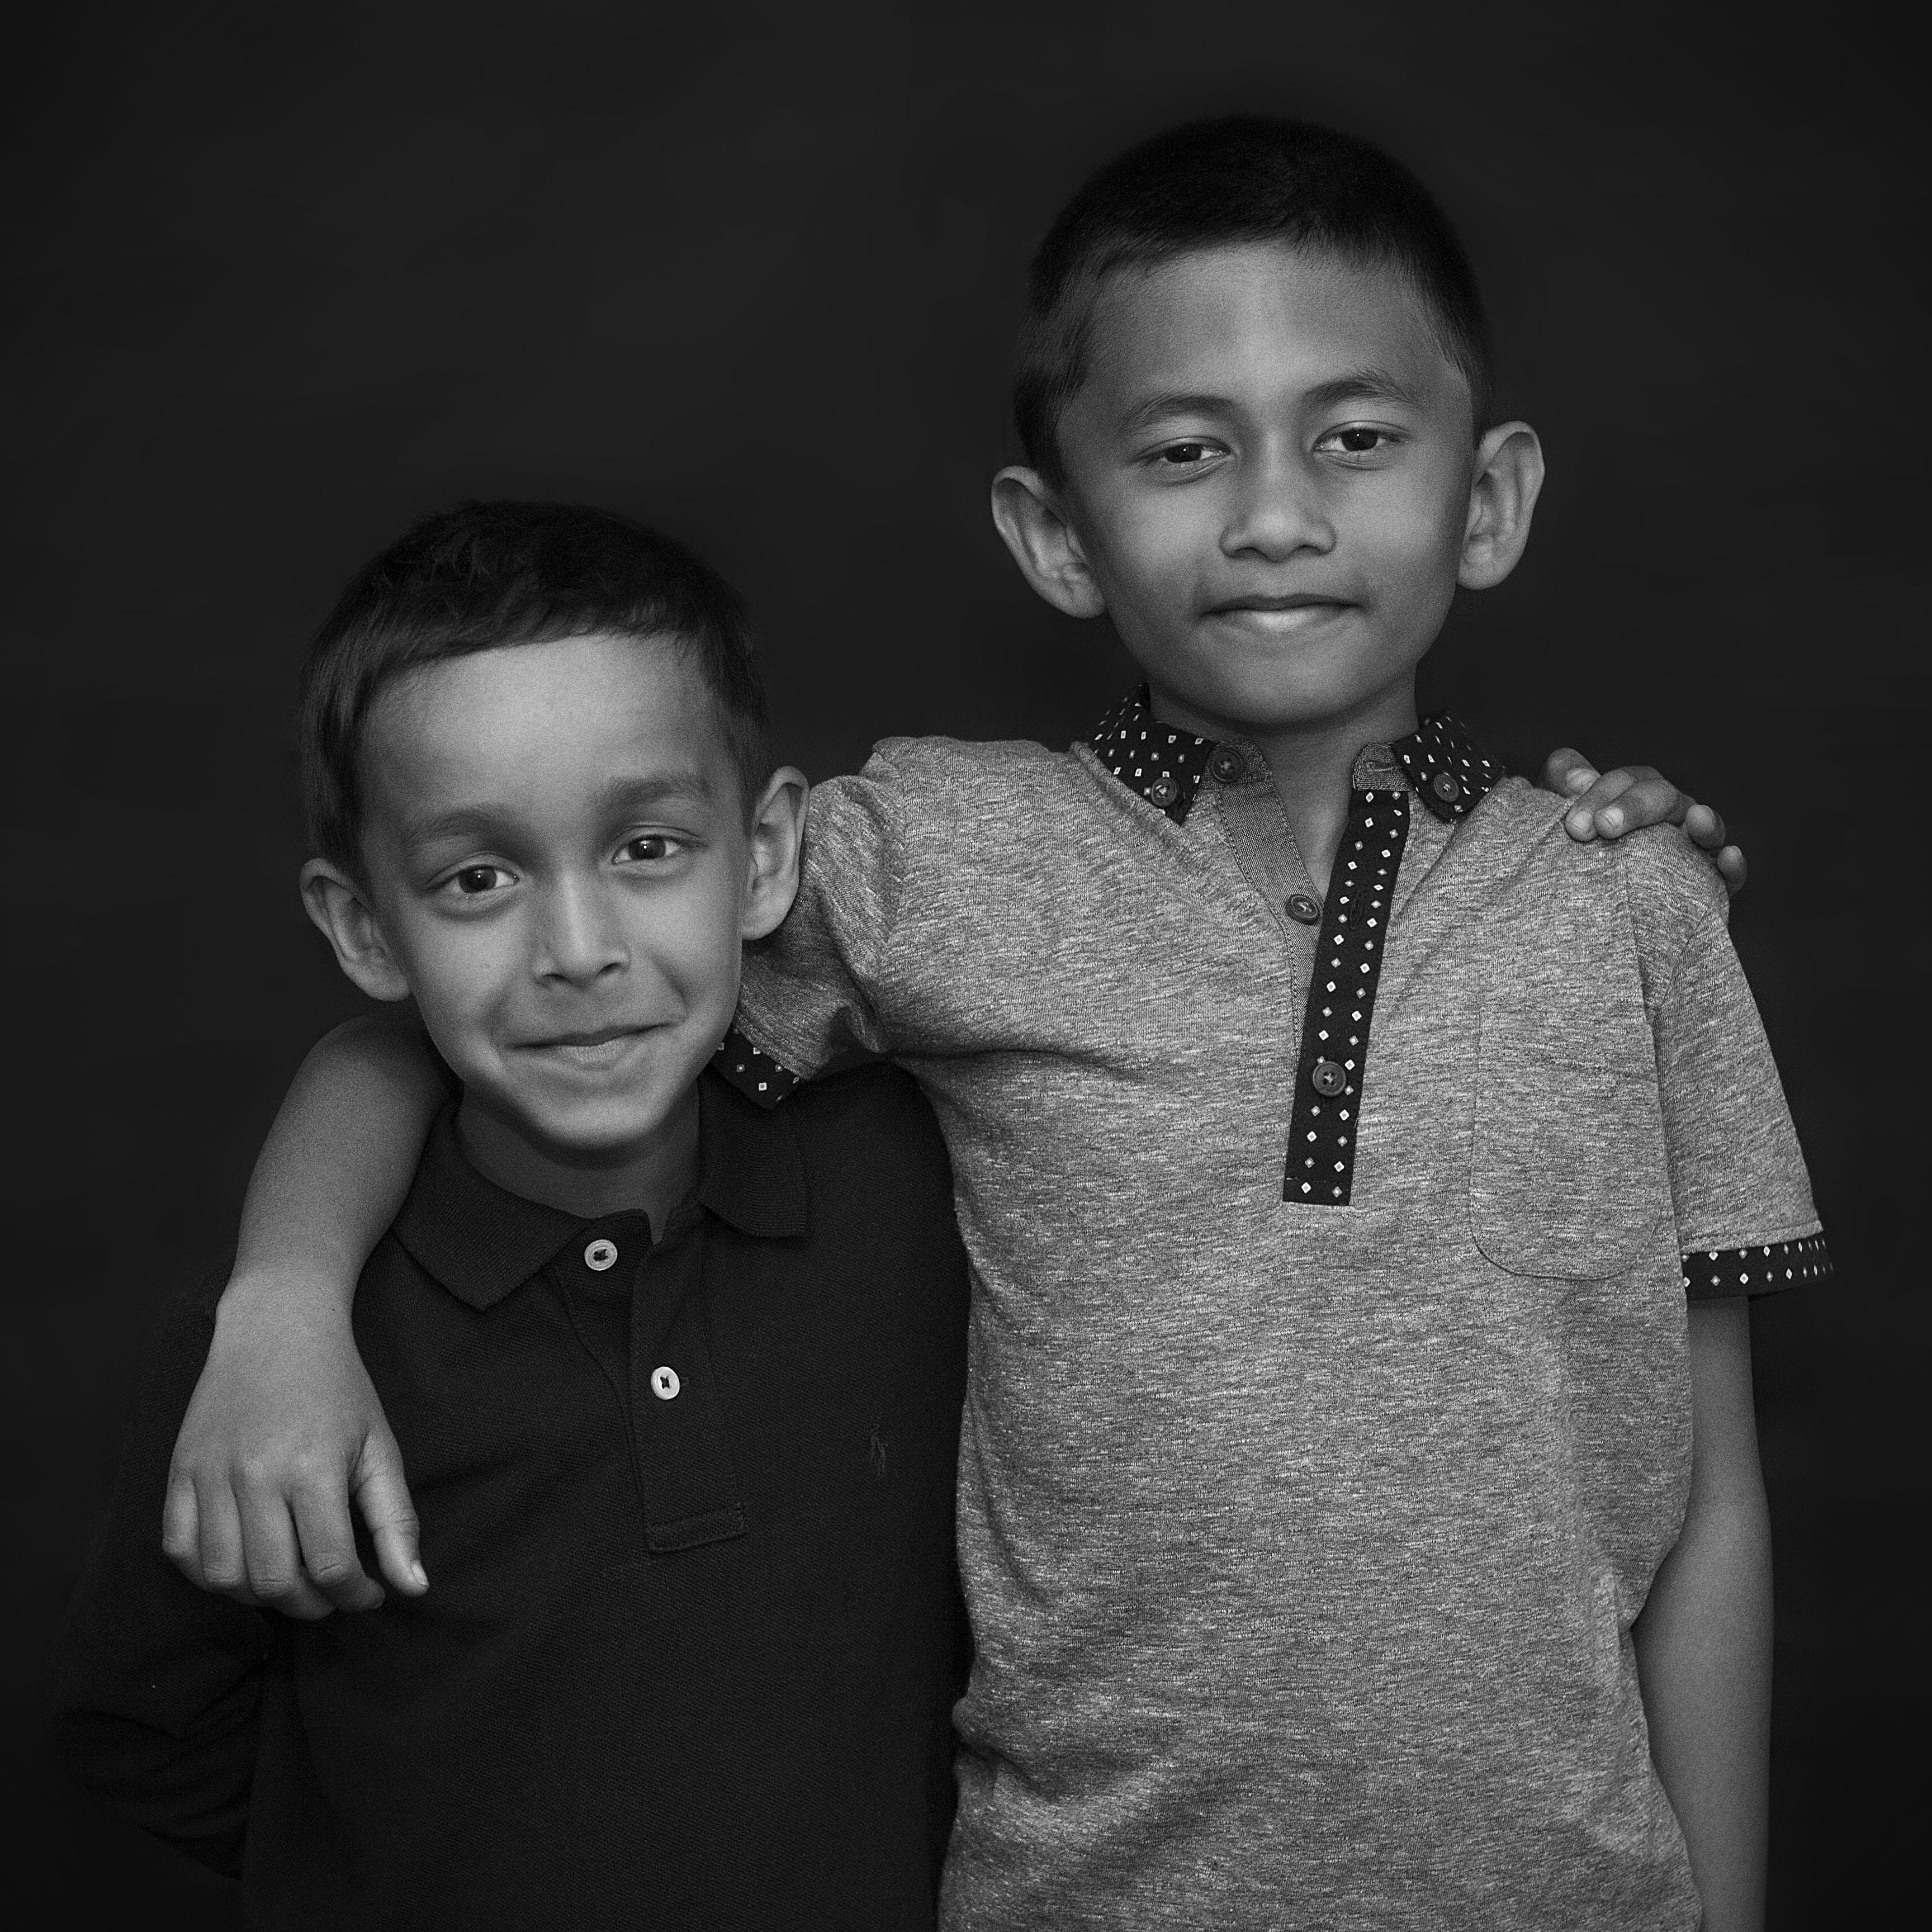 Mahir & Yasin | brothers